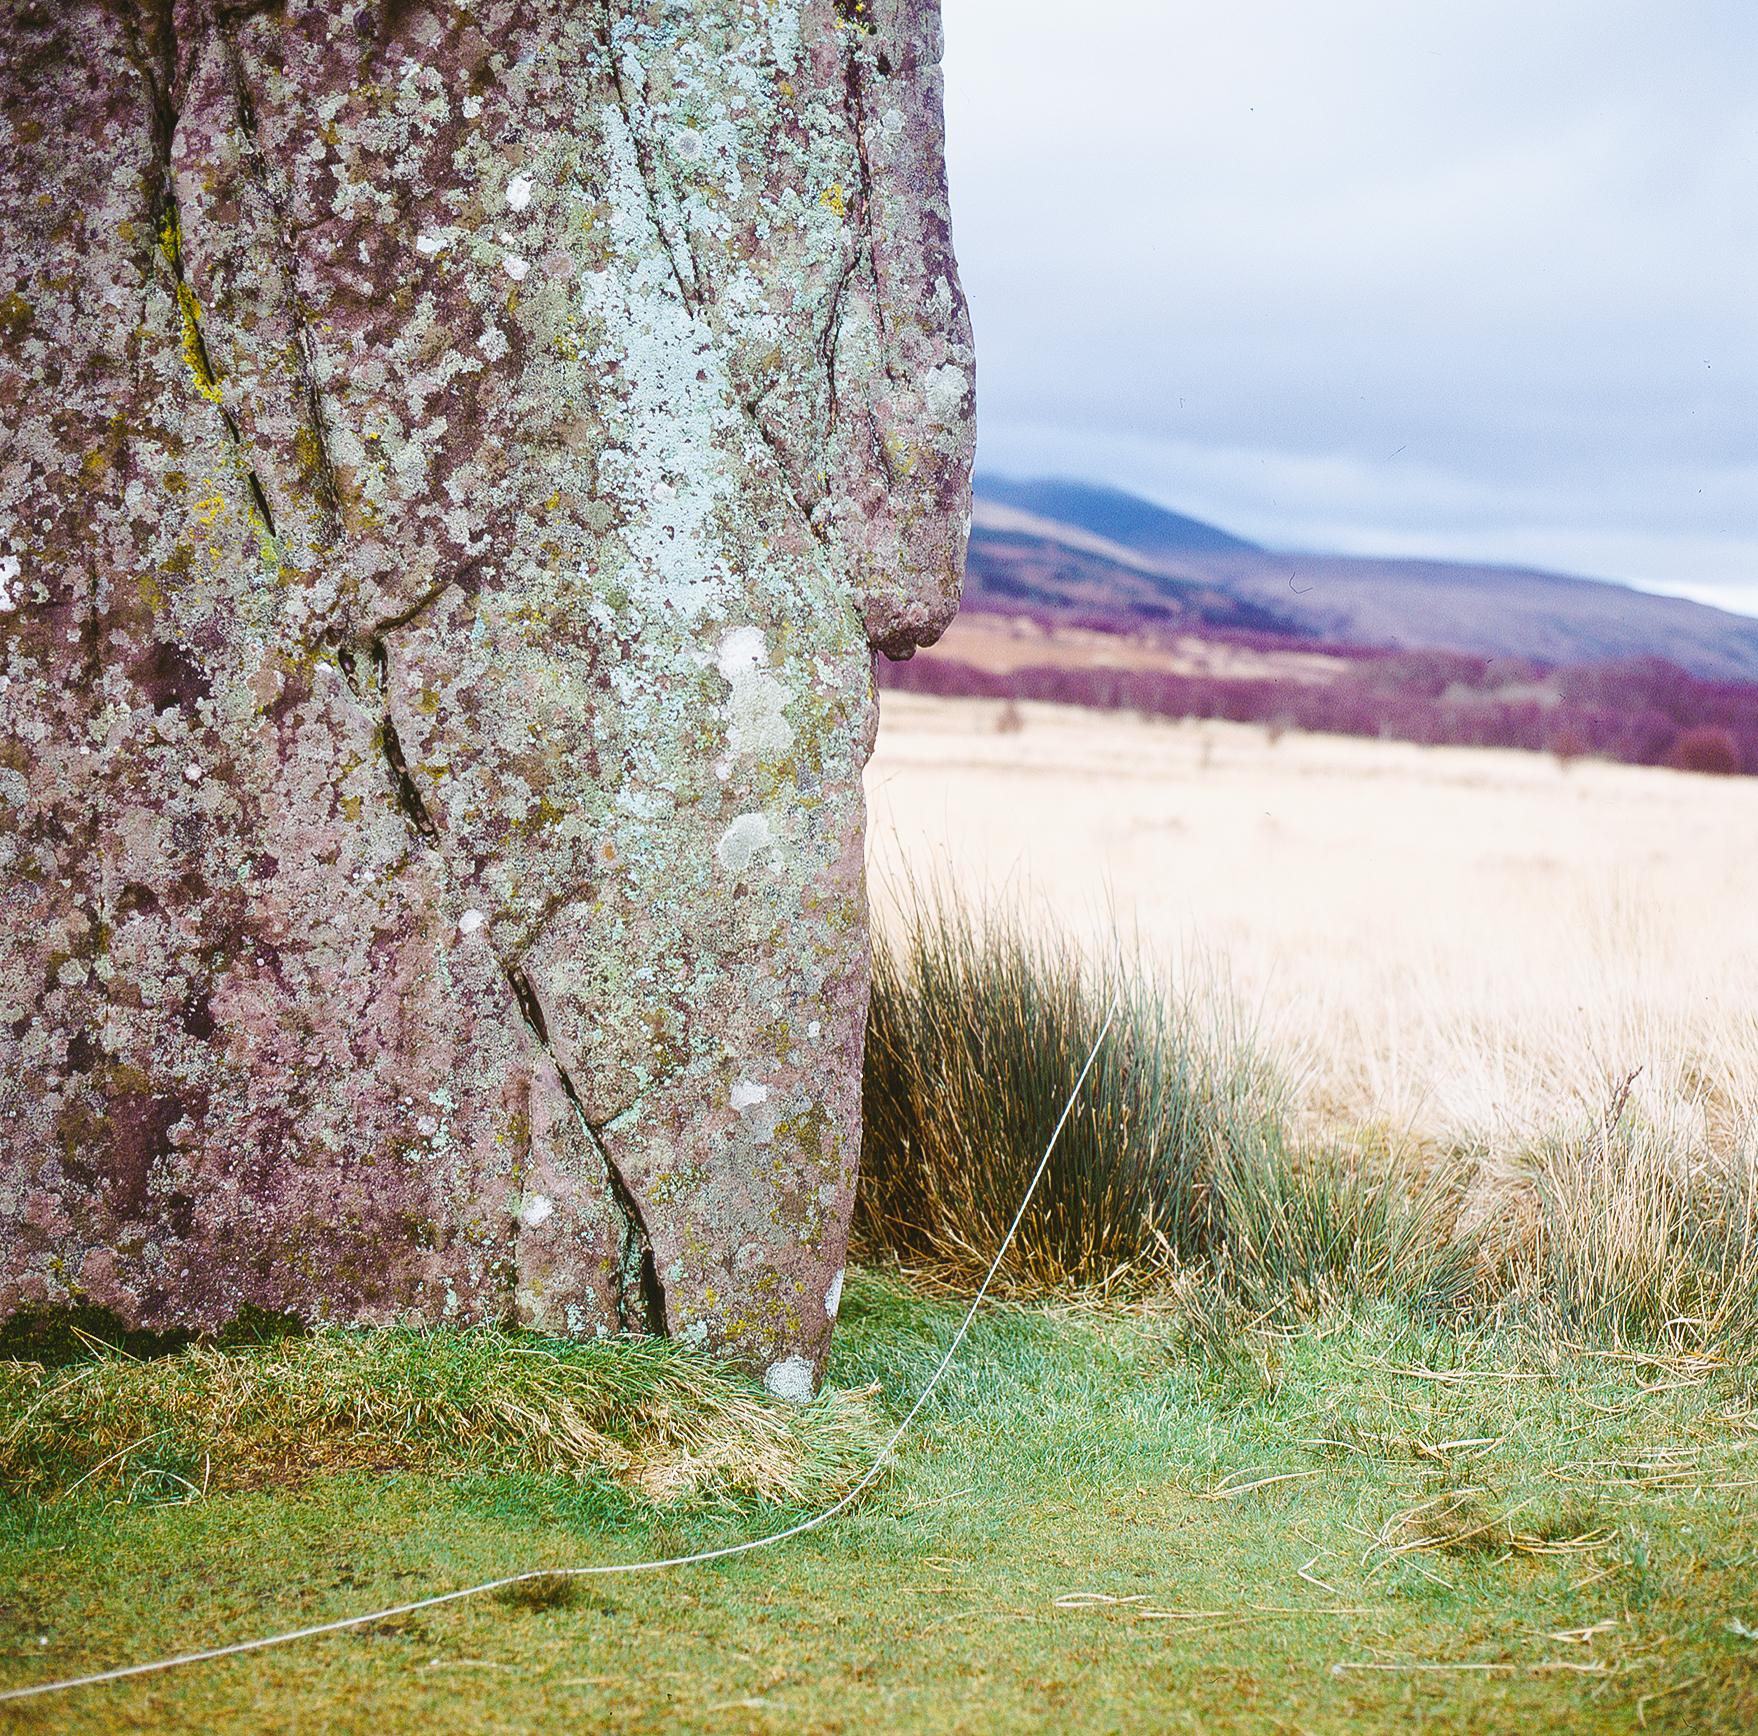 Infinite line and stone